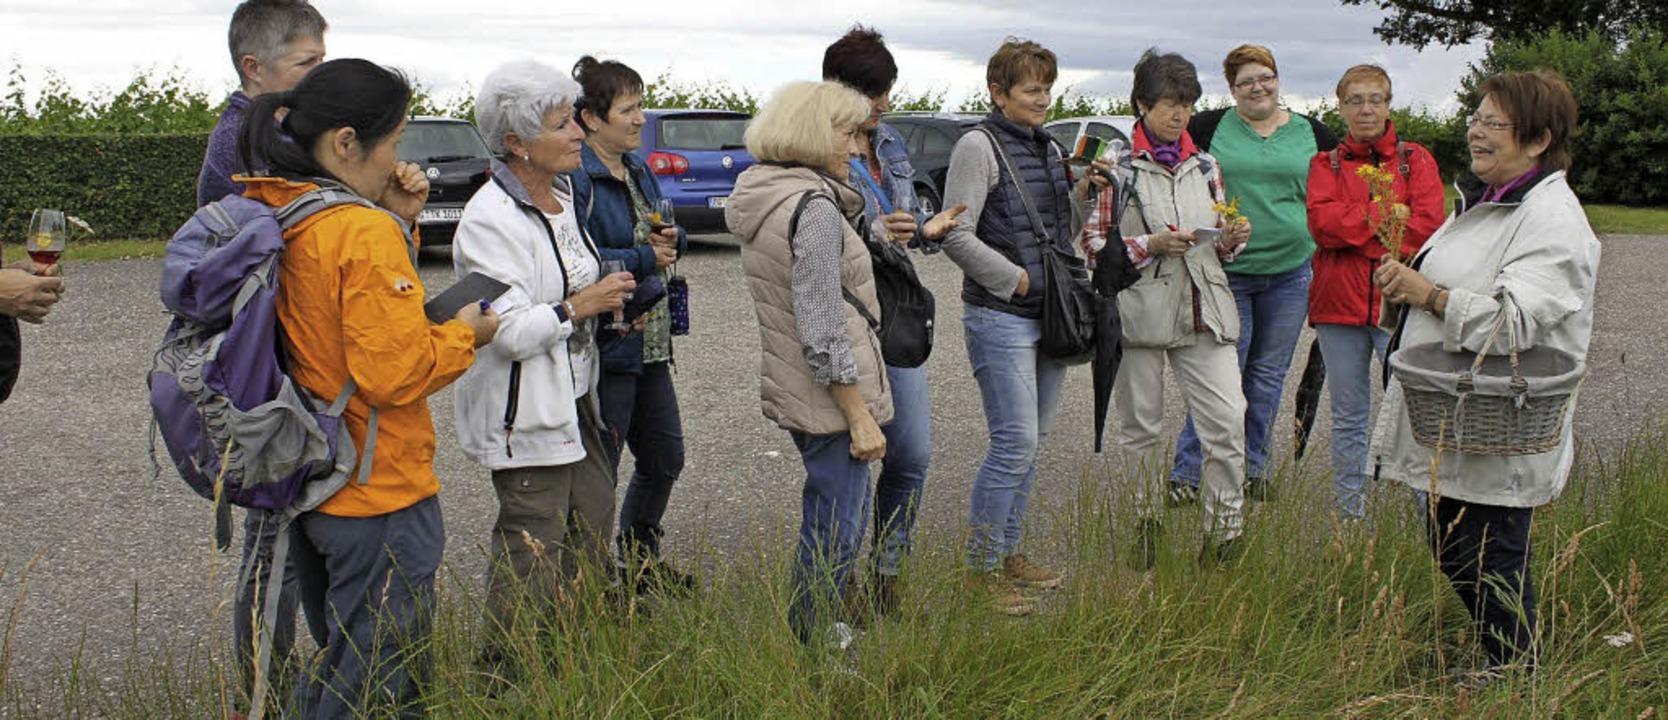 Monika Fischer  (rechts) zeigt, was die Natur zu bieten hat.   | Foto: Adelbert Mutz